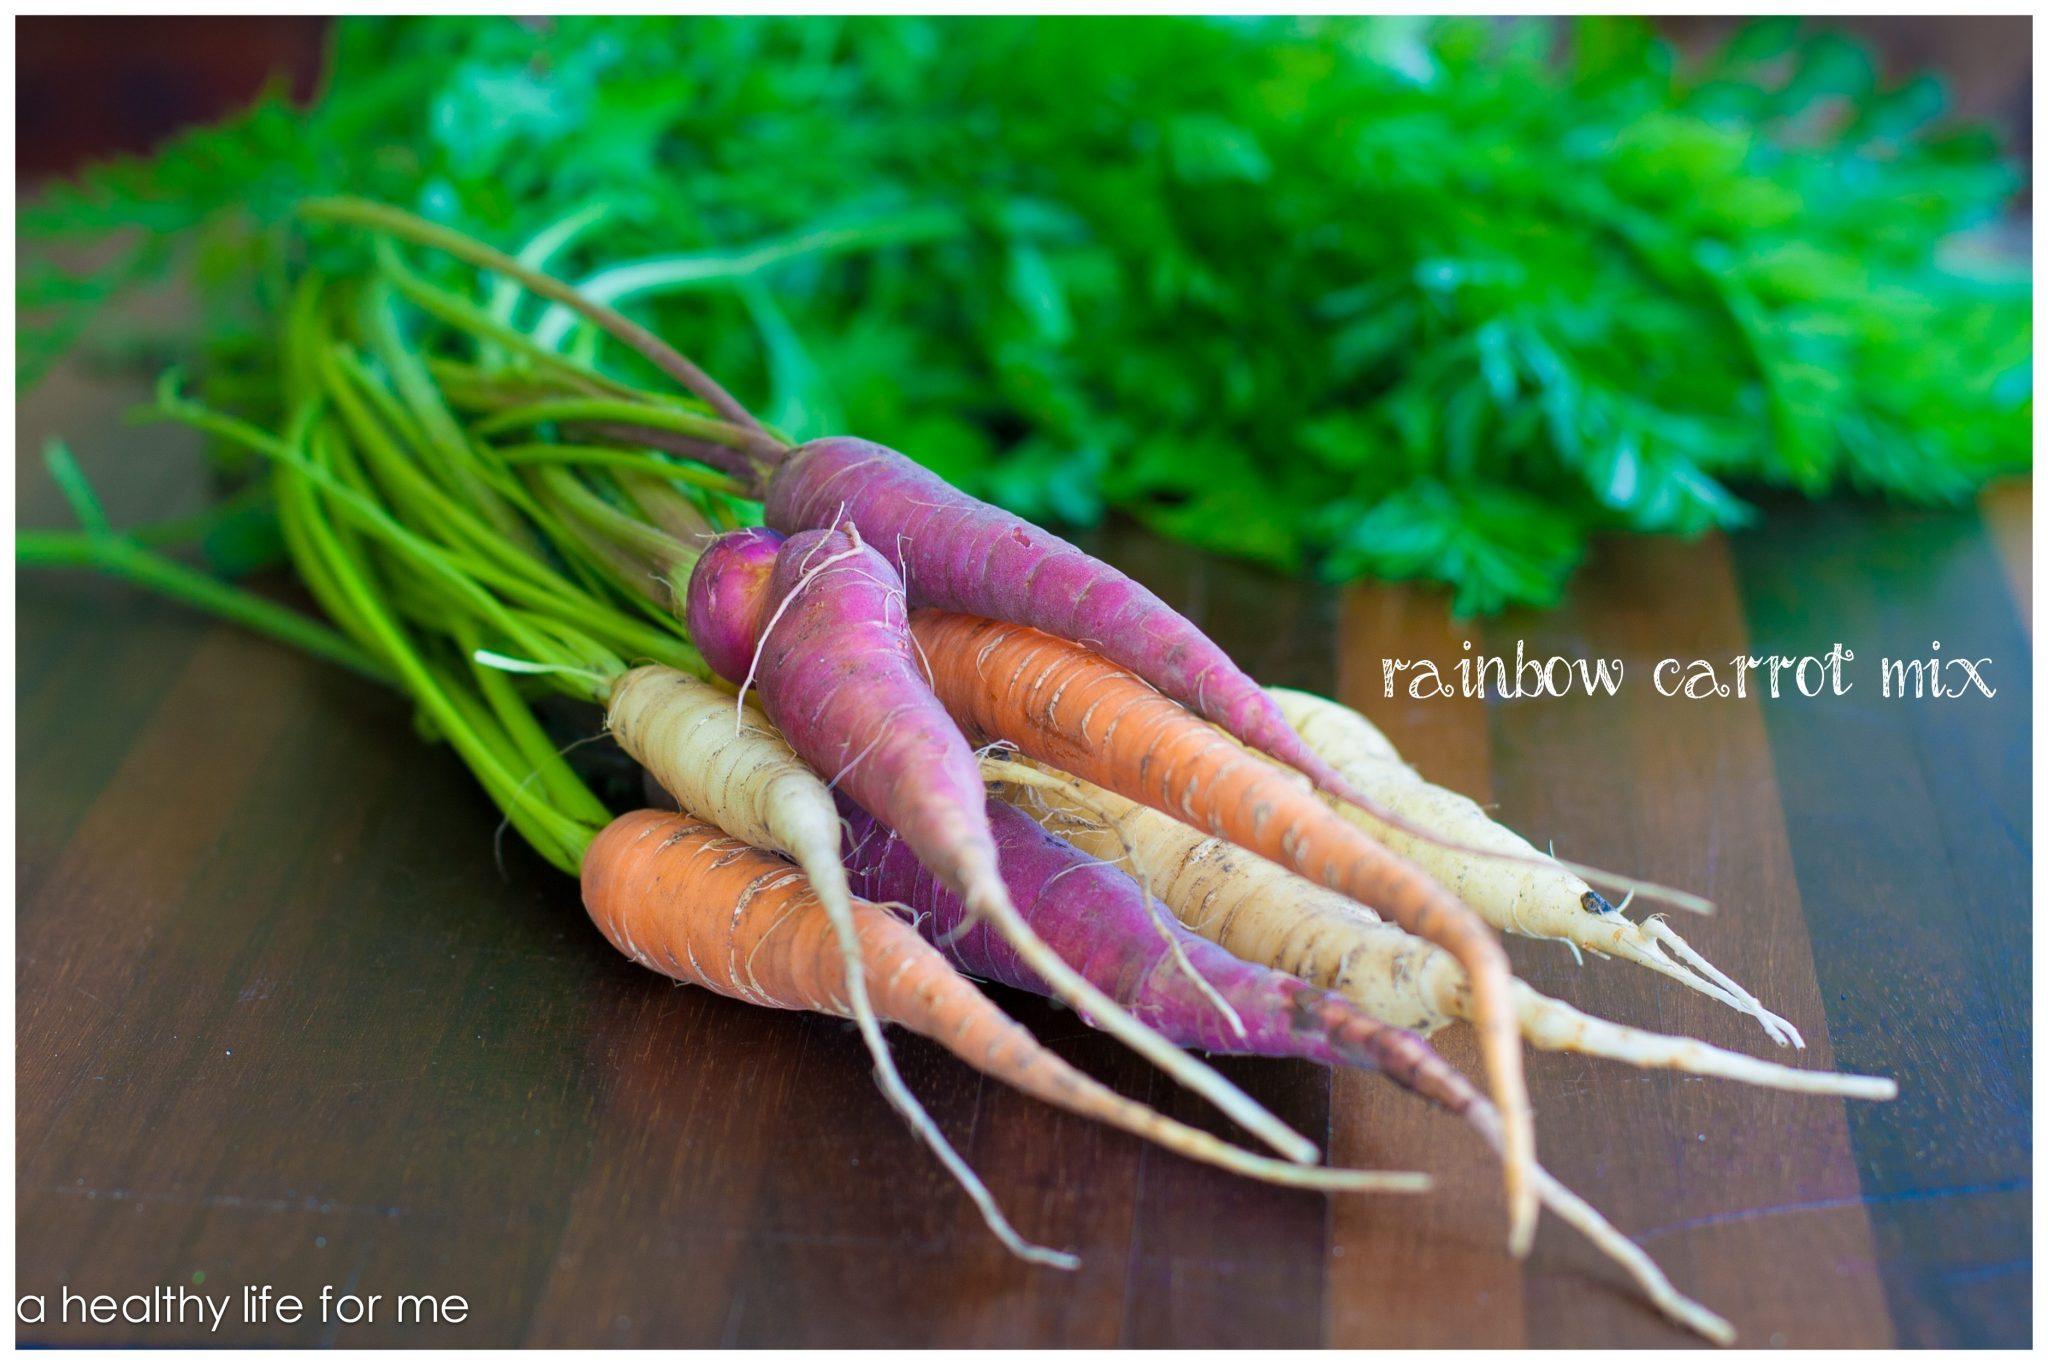 Organic Rainbow Carrots Organic Rainbow Carrot Mix